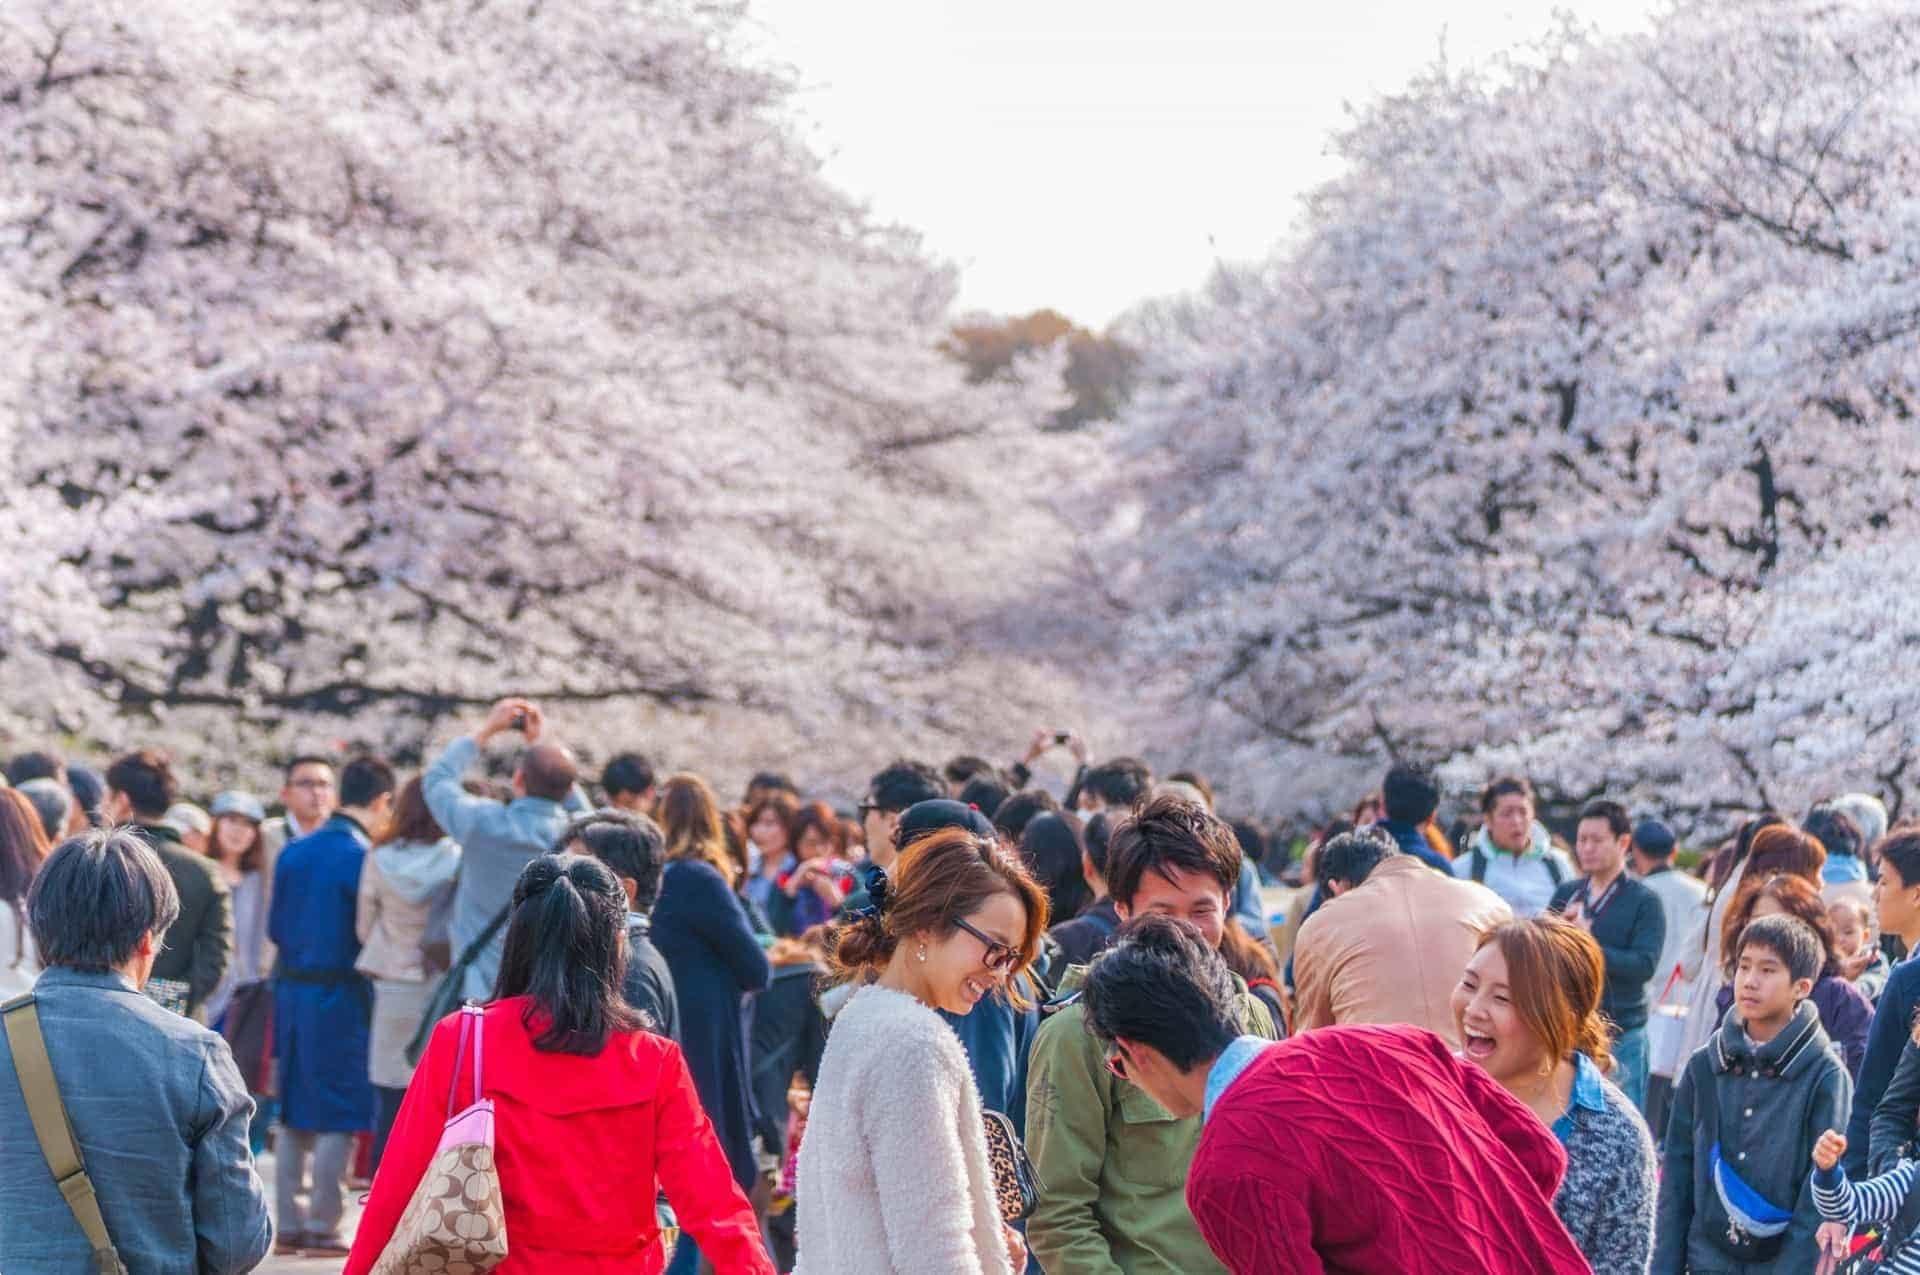 Japanese tour